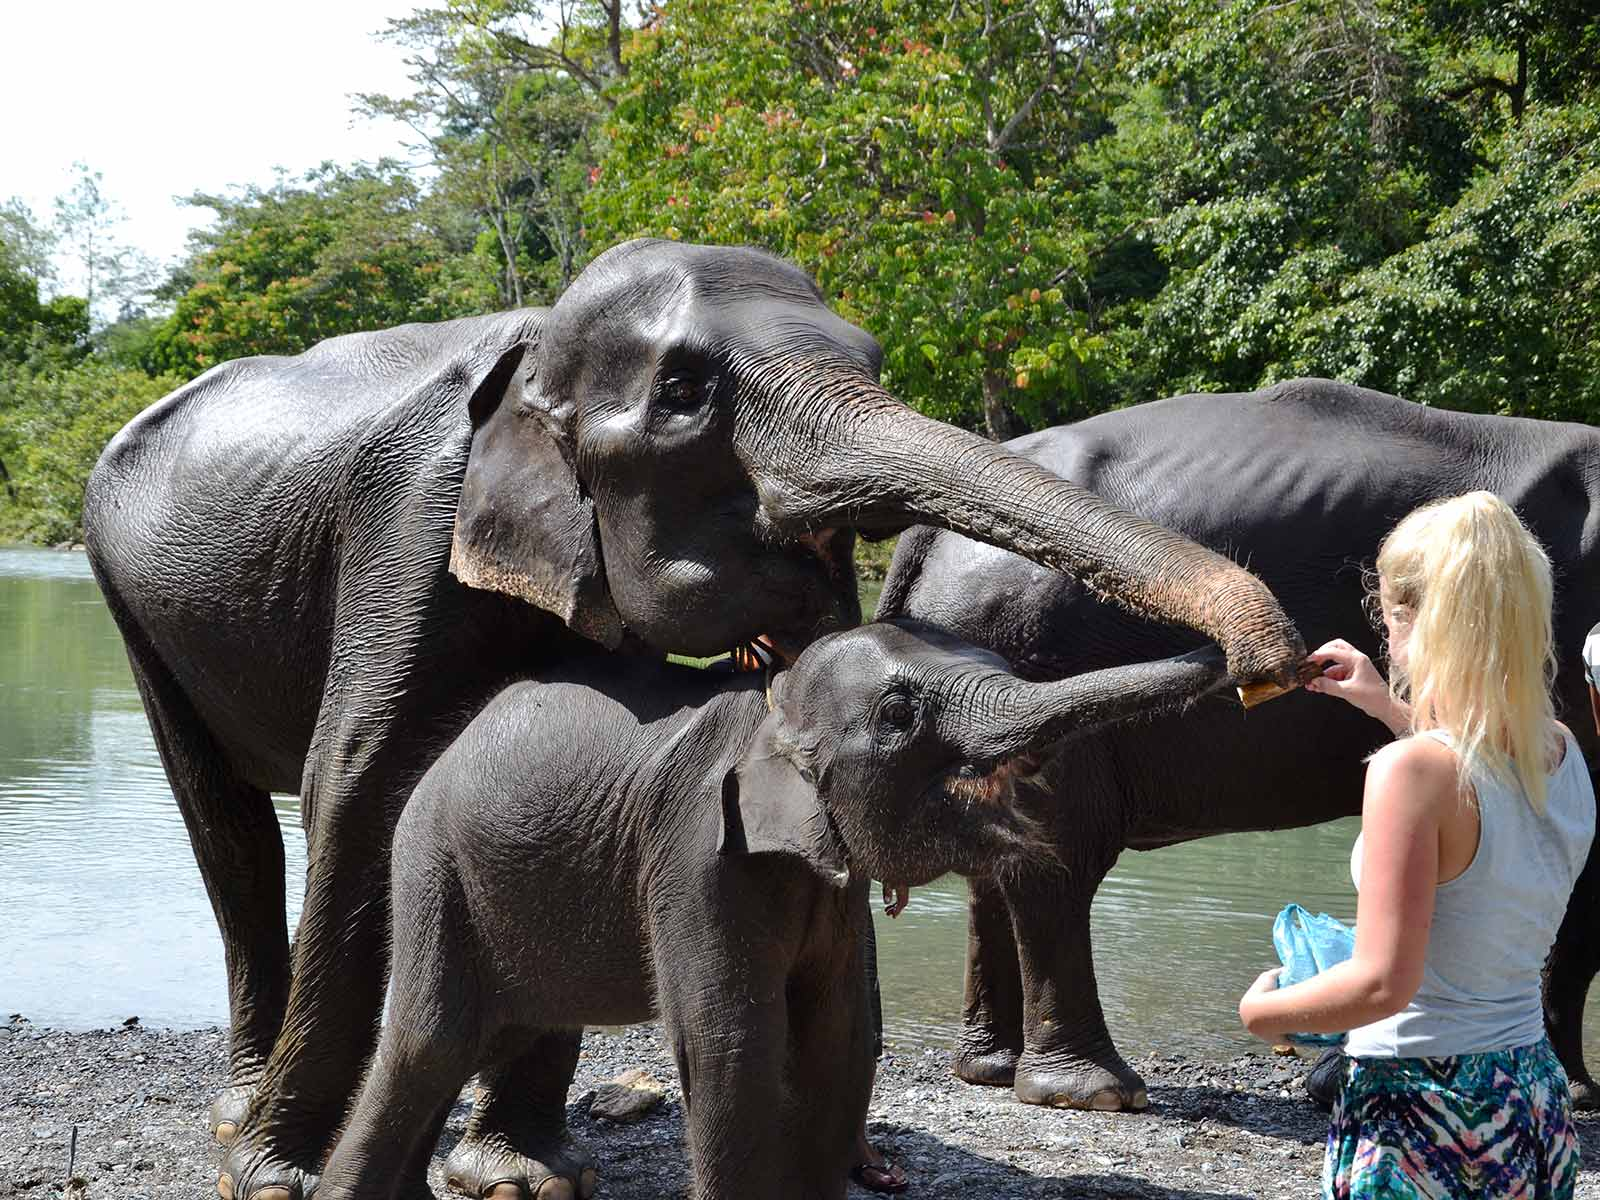 tips duurzaam toerisme olifanten wassen irene op sumatra